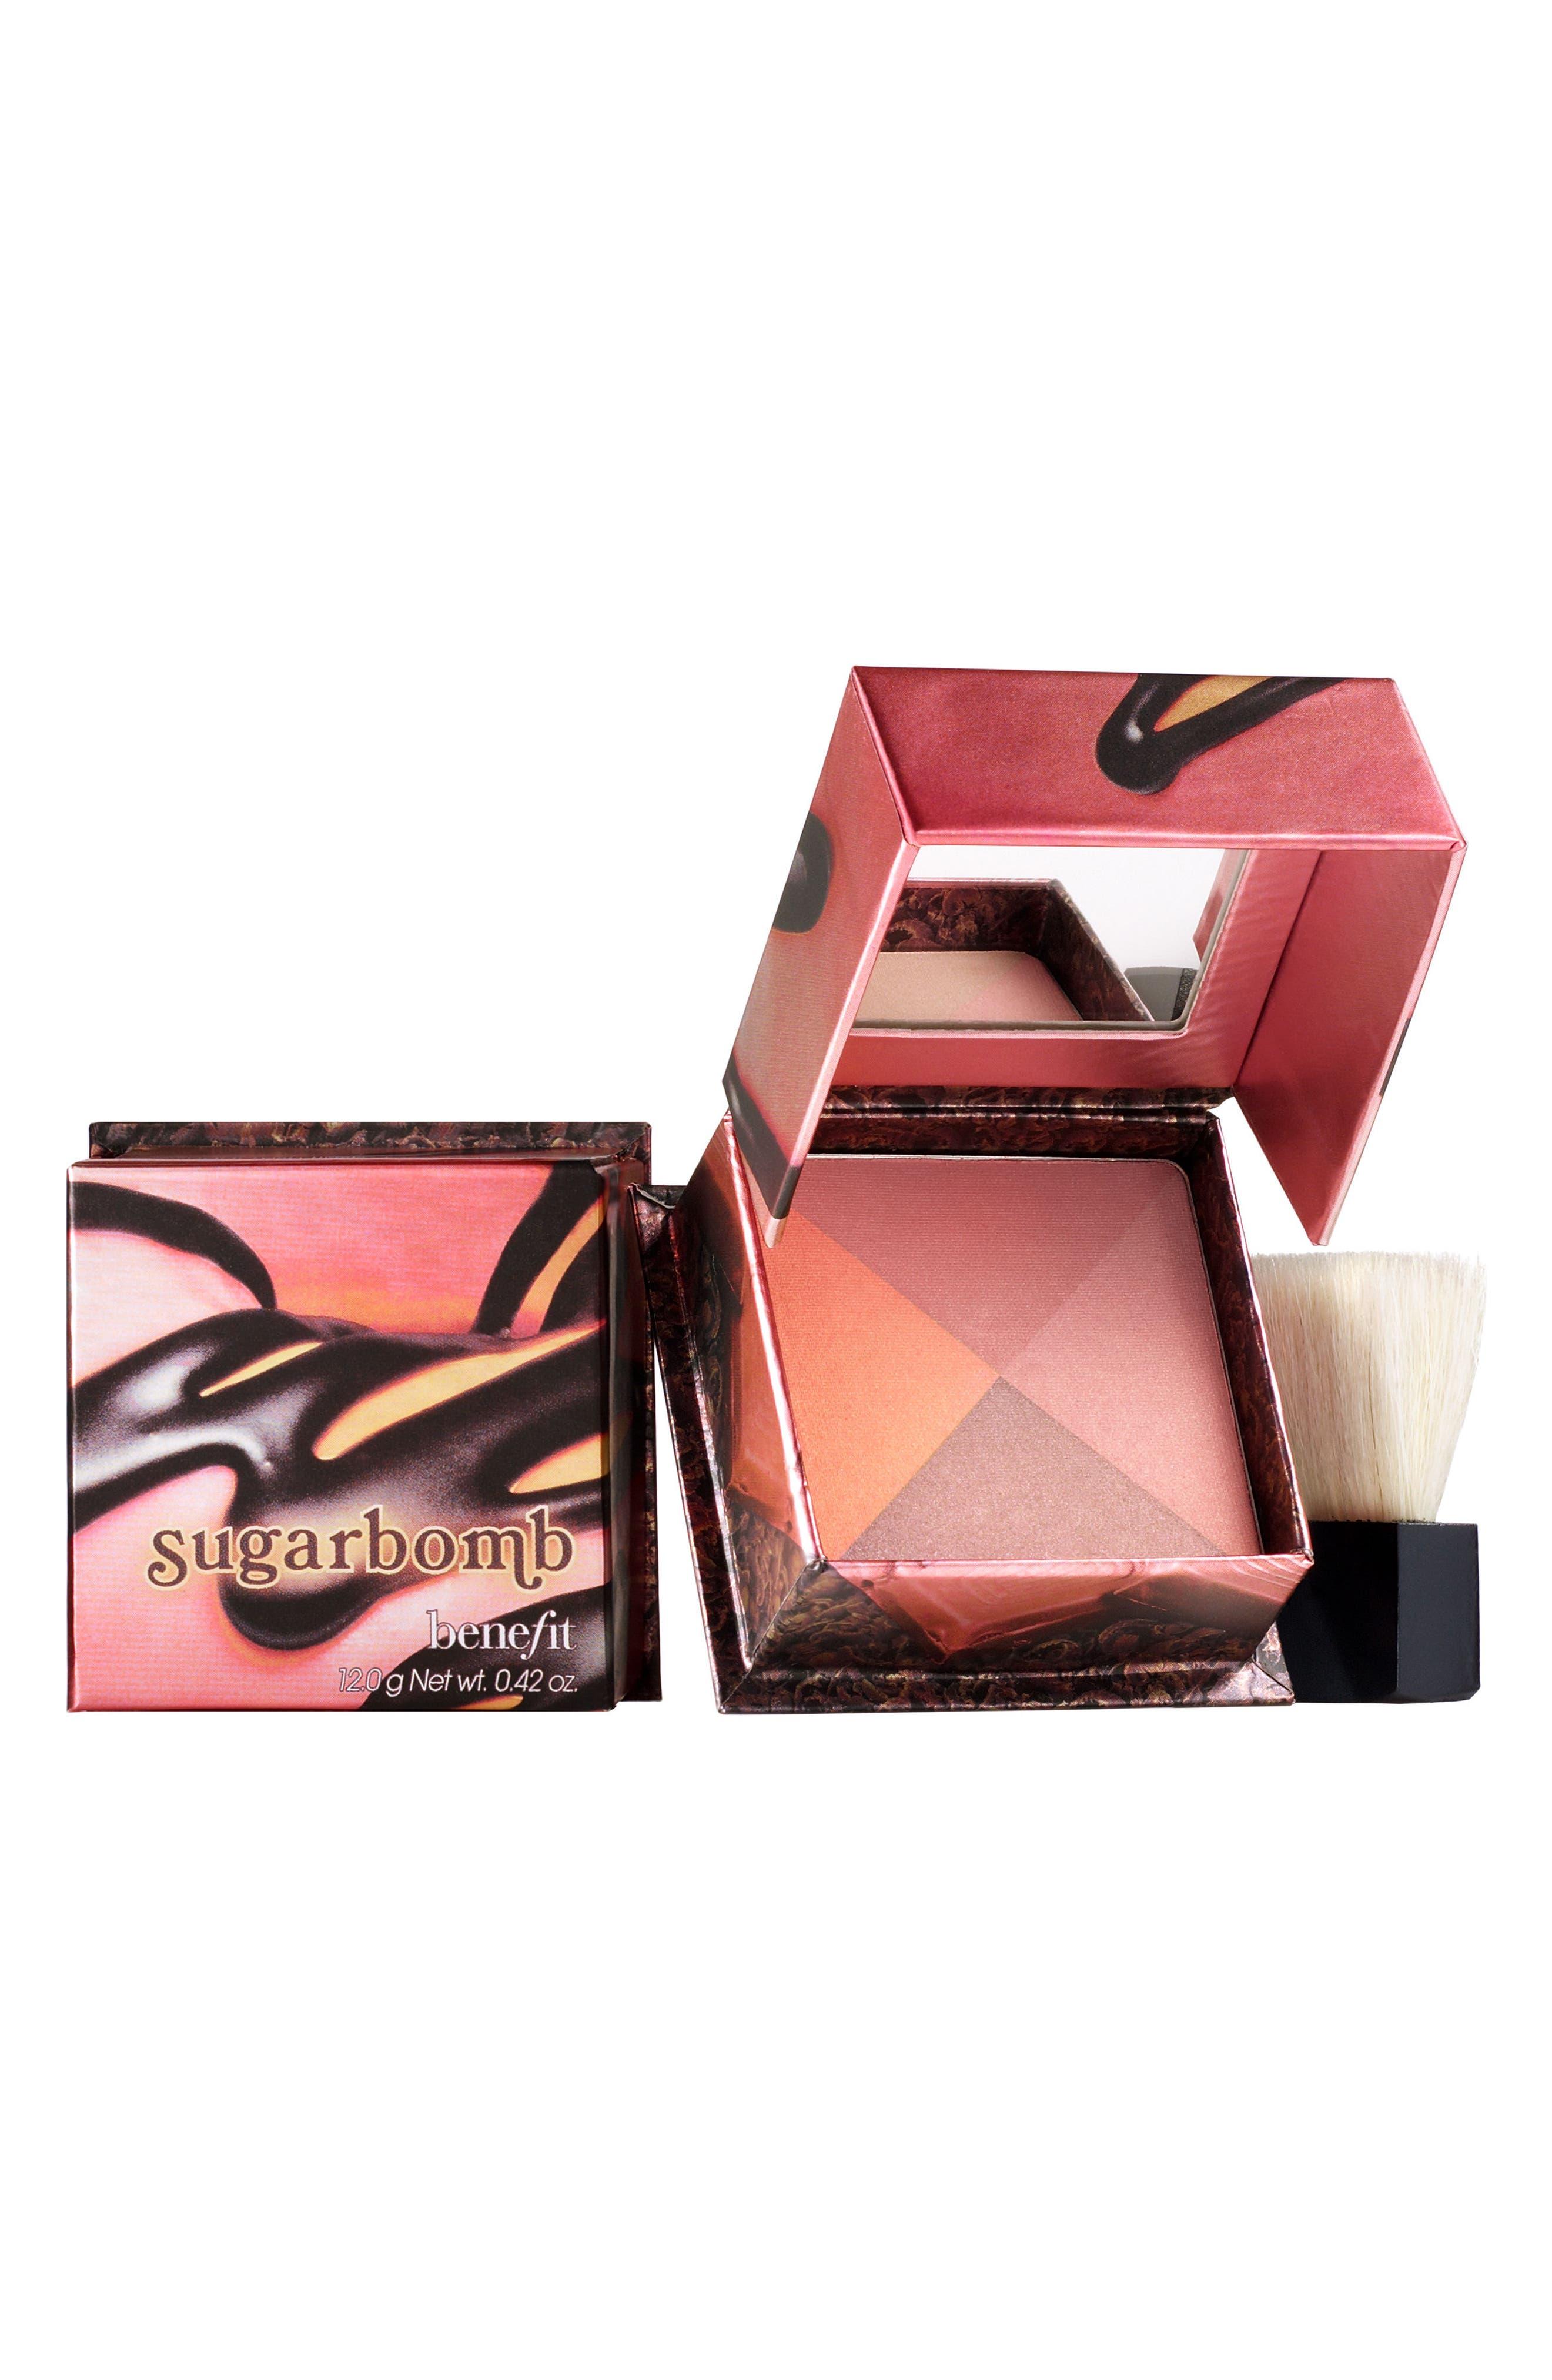 Benefit Sugarbomb Shimmer Powder Blush,                             Main thumbnail 1, color,                             SUGAR RUSH FLUSH